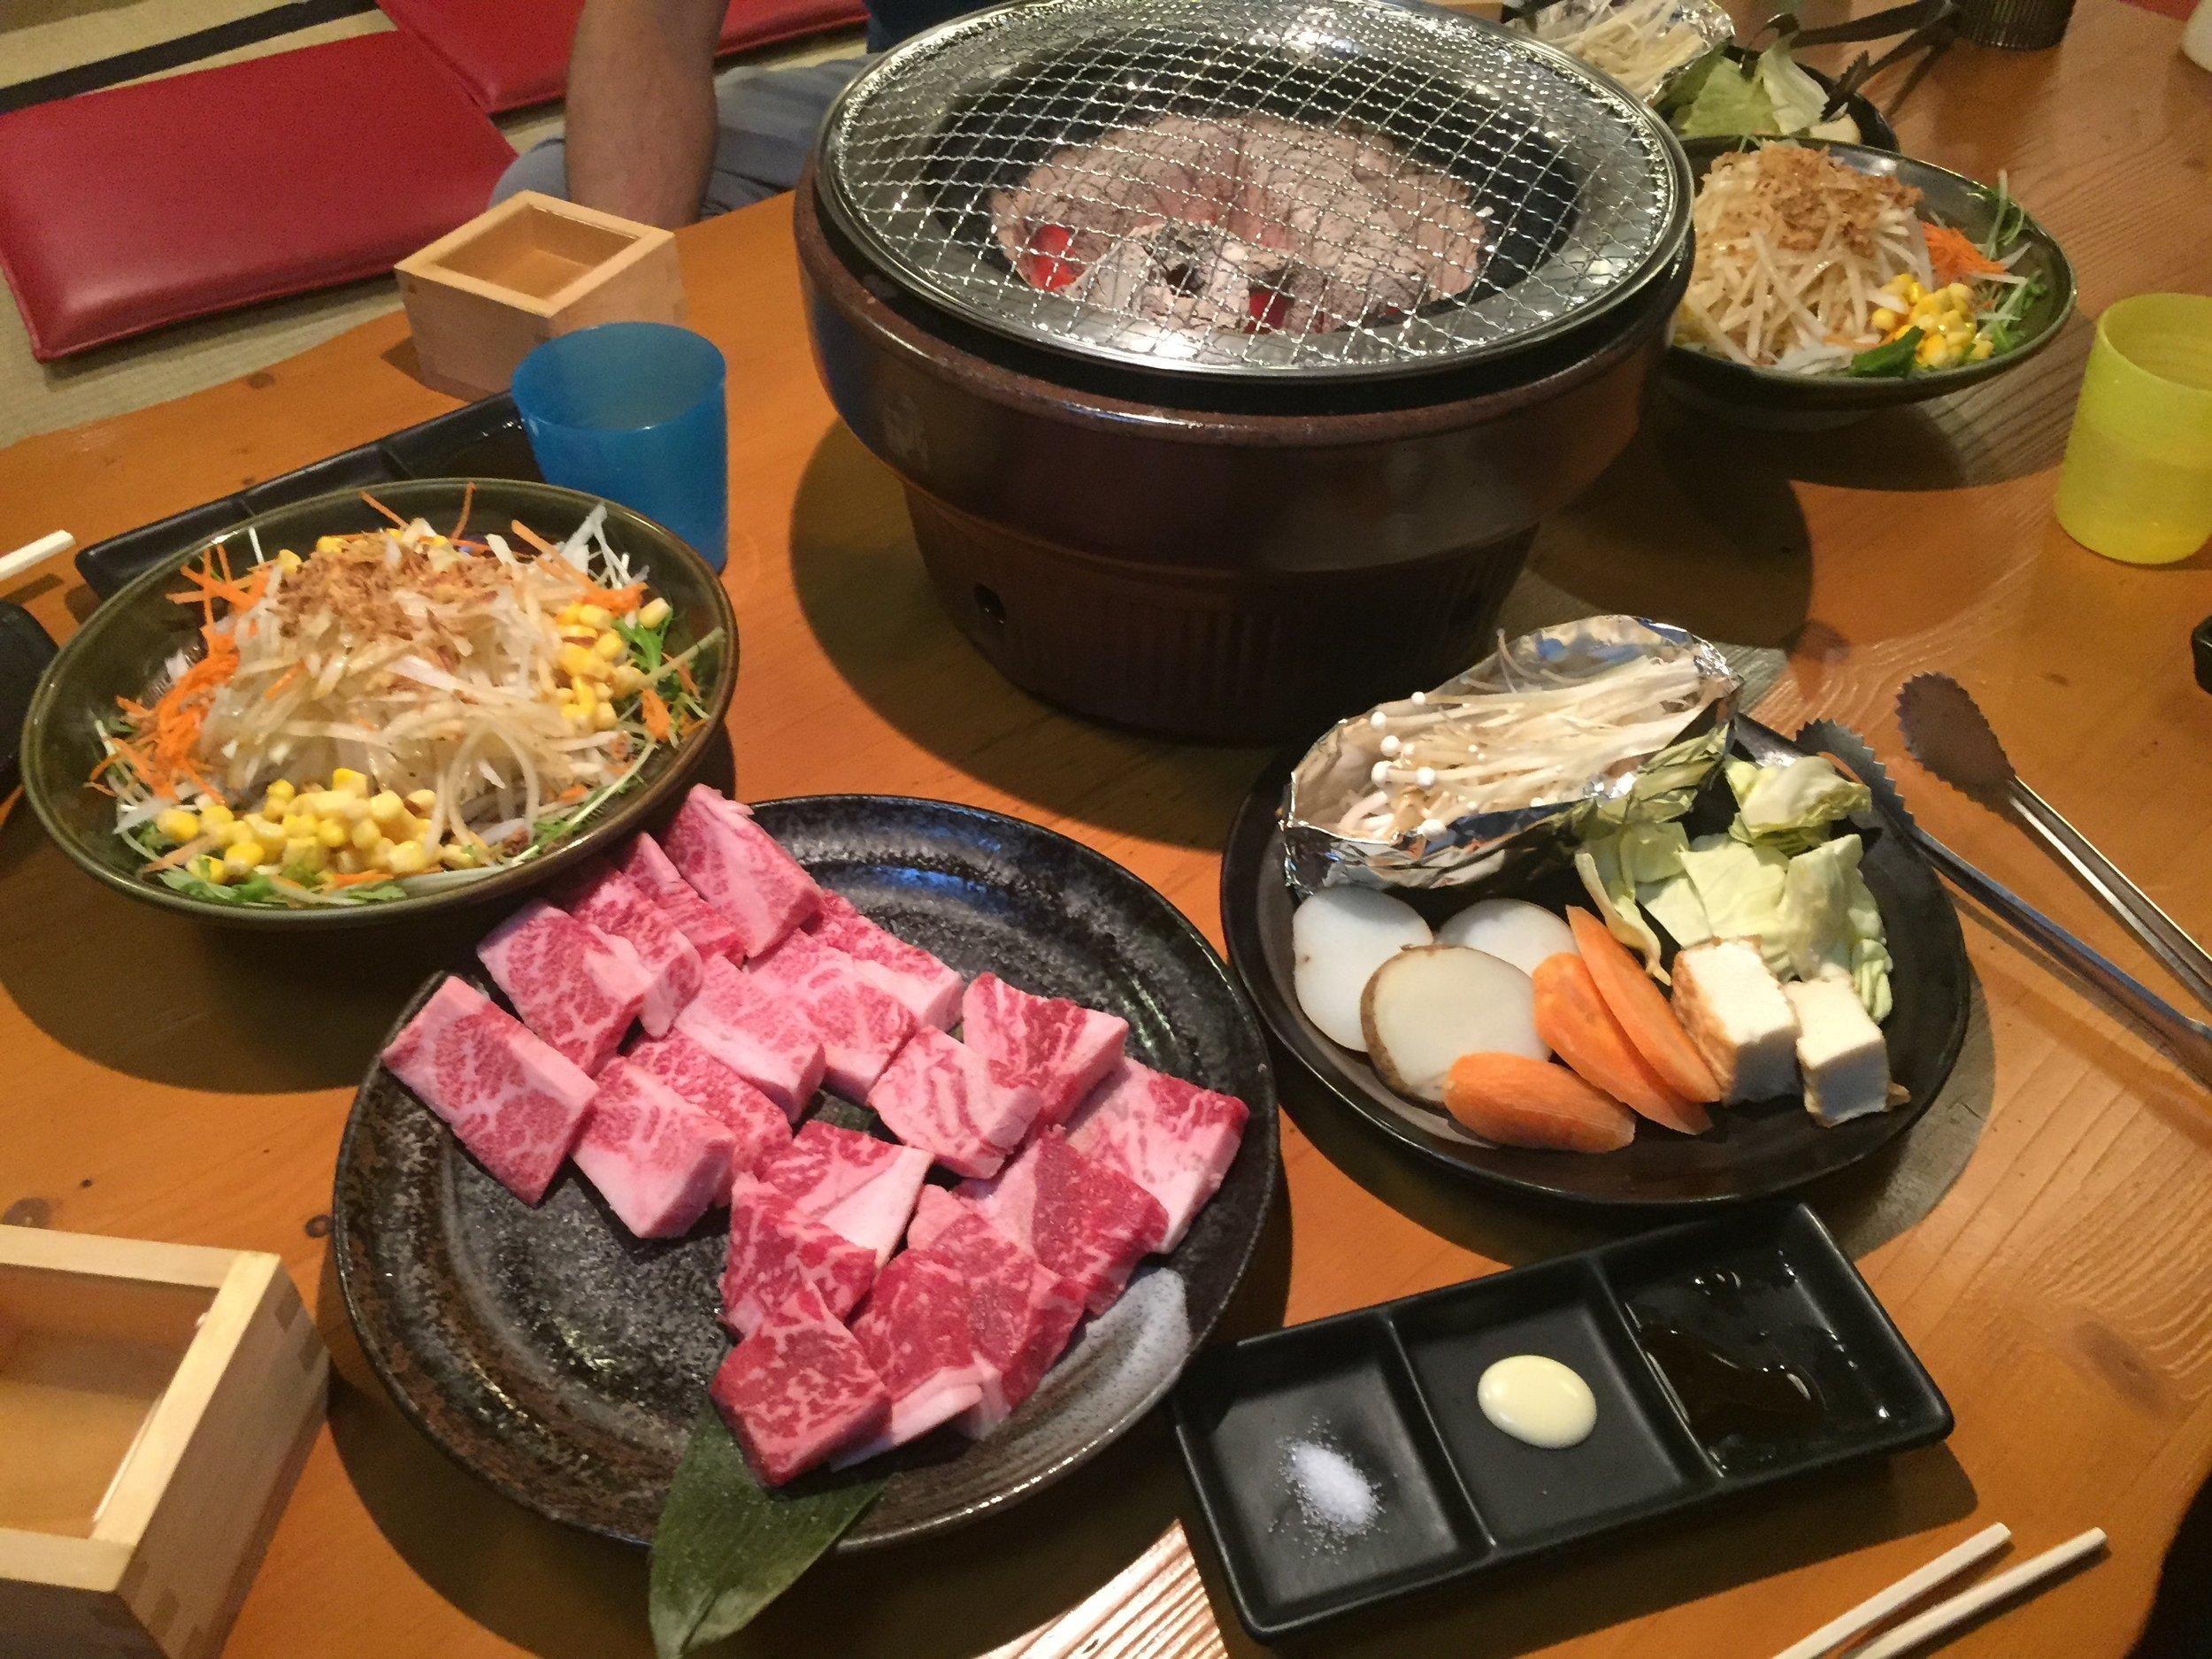 Deluxe Wagyu Beef Set at Marukame Korean Barbeque Restaurant